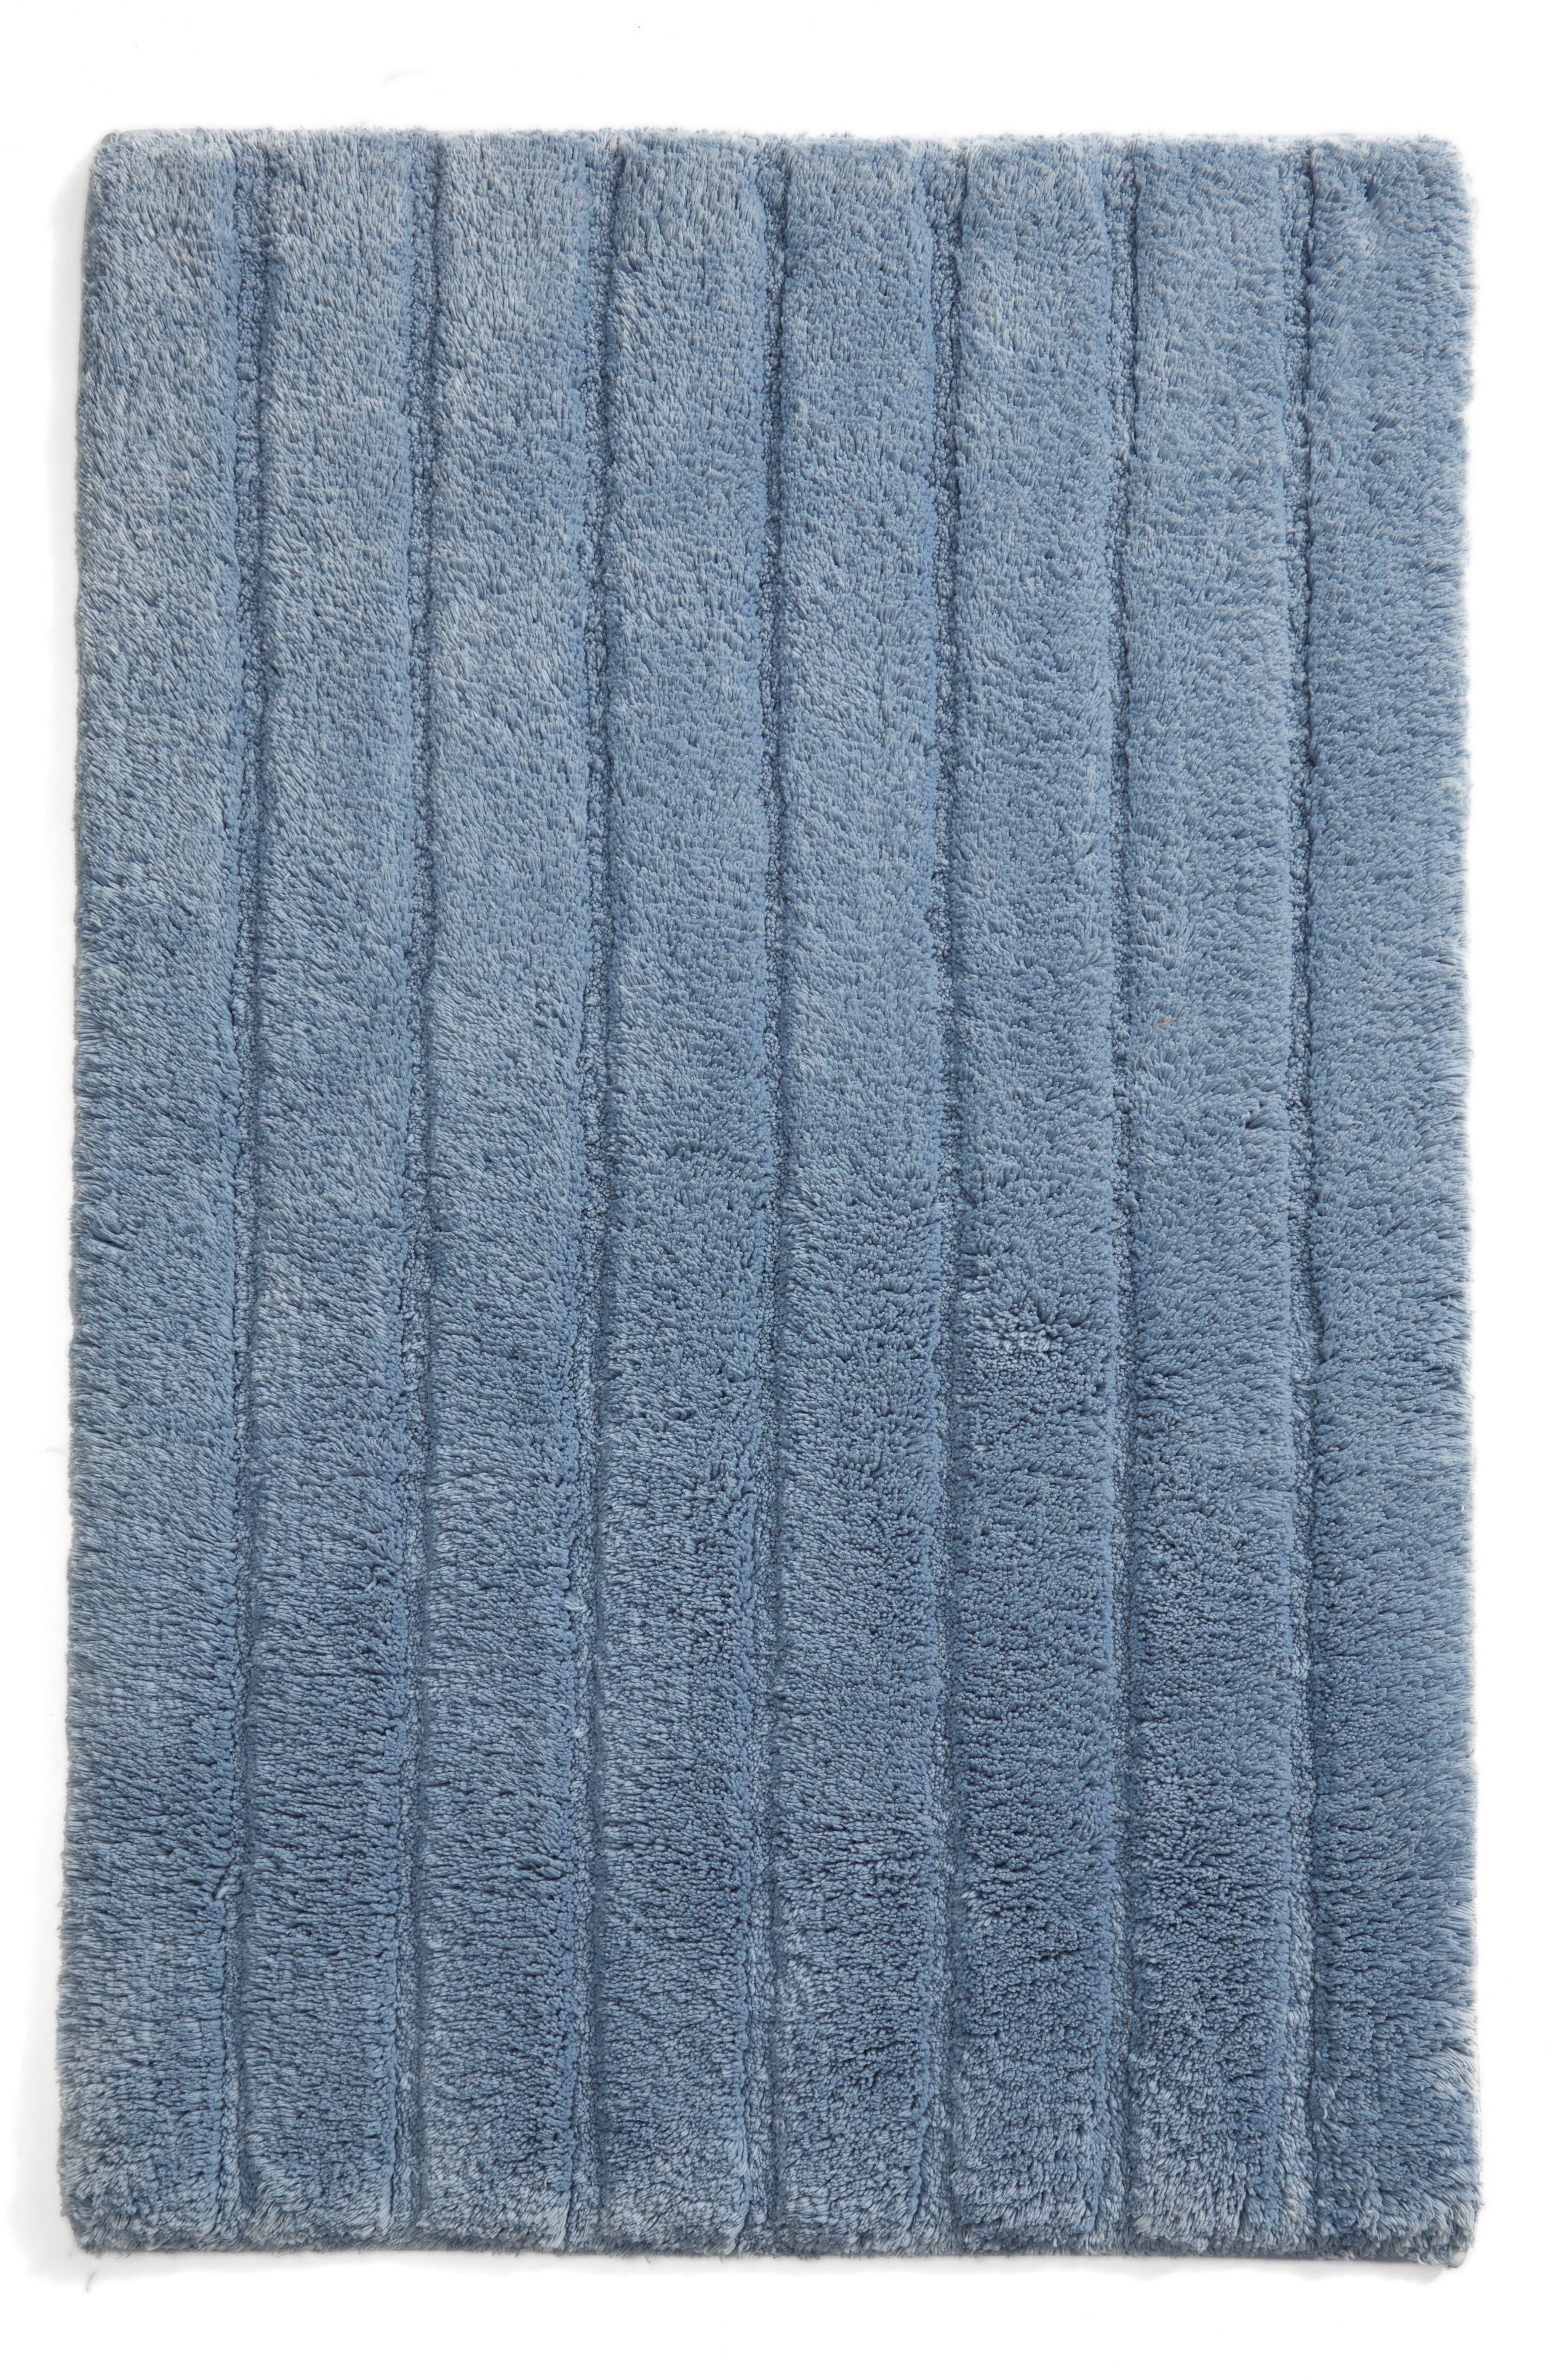 Ribbed Velour Bath Rug,                         Main,                         color, Blue Chambray